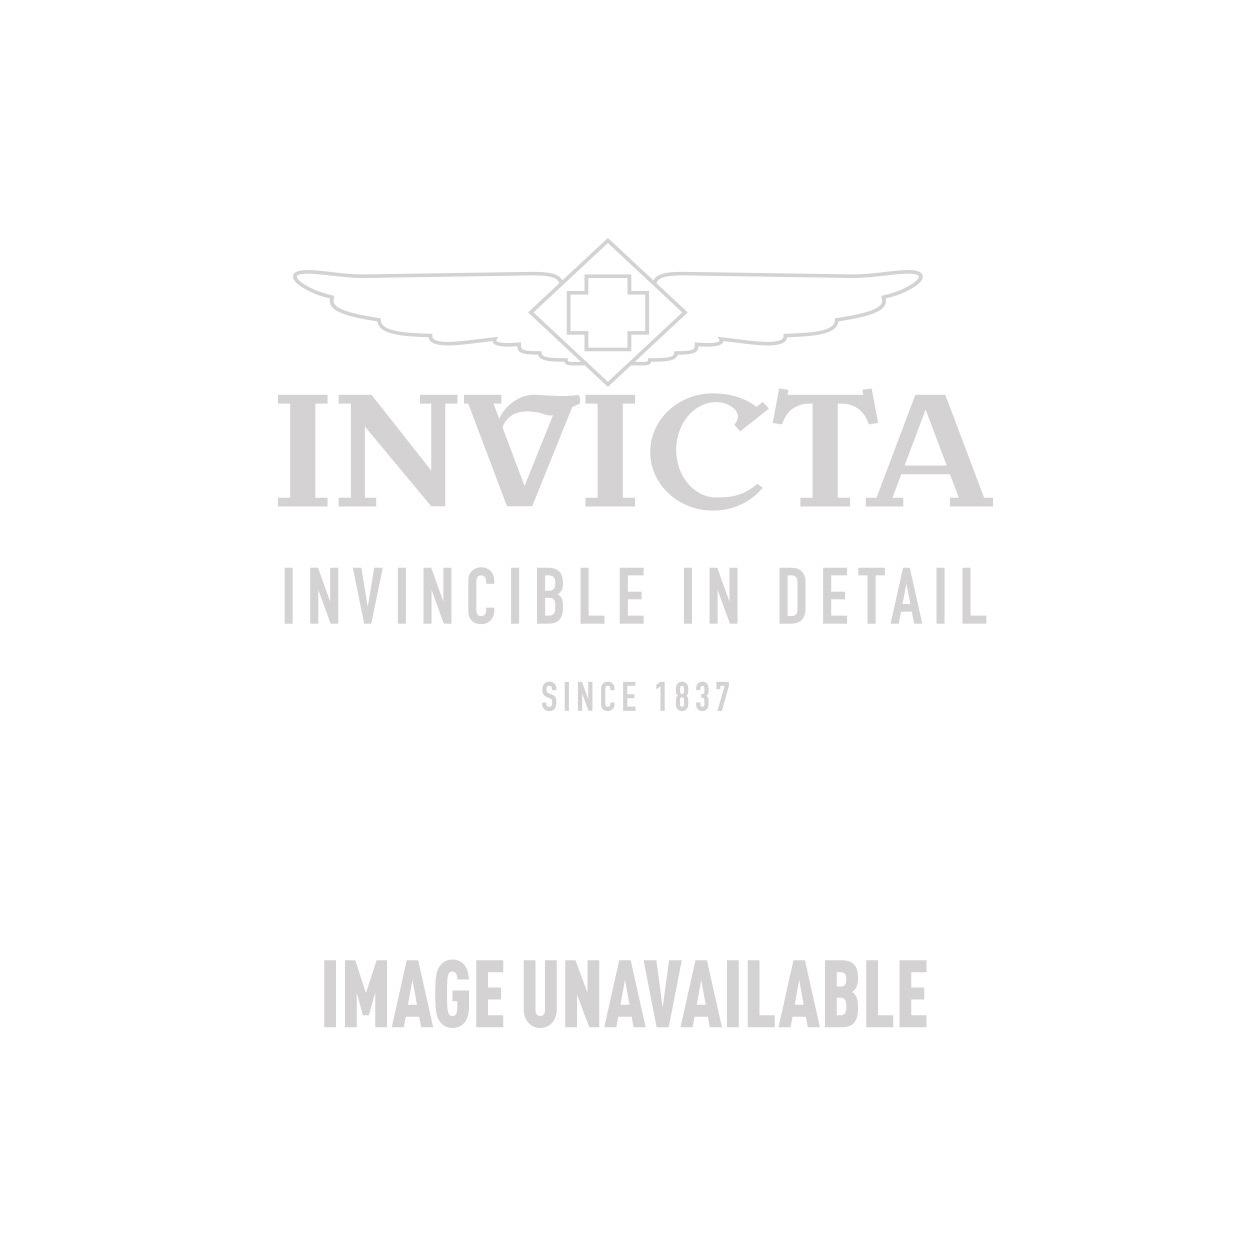 Invicta Sea Base Swiss Made Quartz Watch - Titanium case with Black tone Polyurethane band - Model 17544